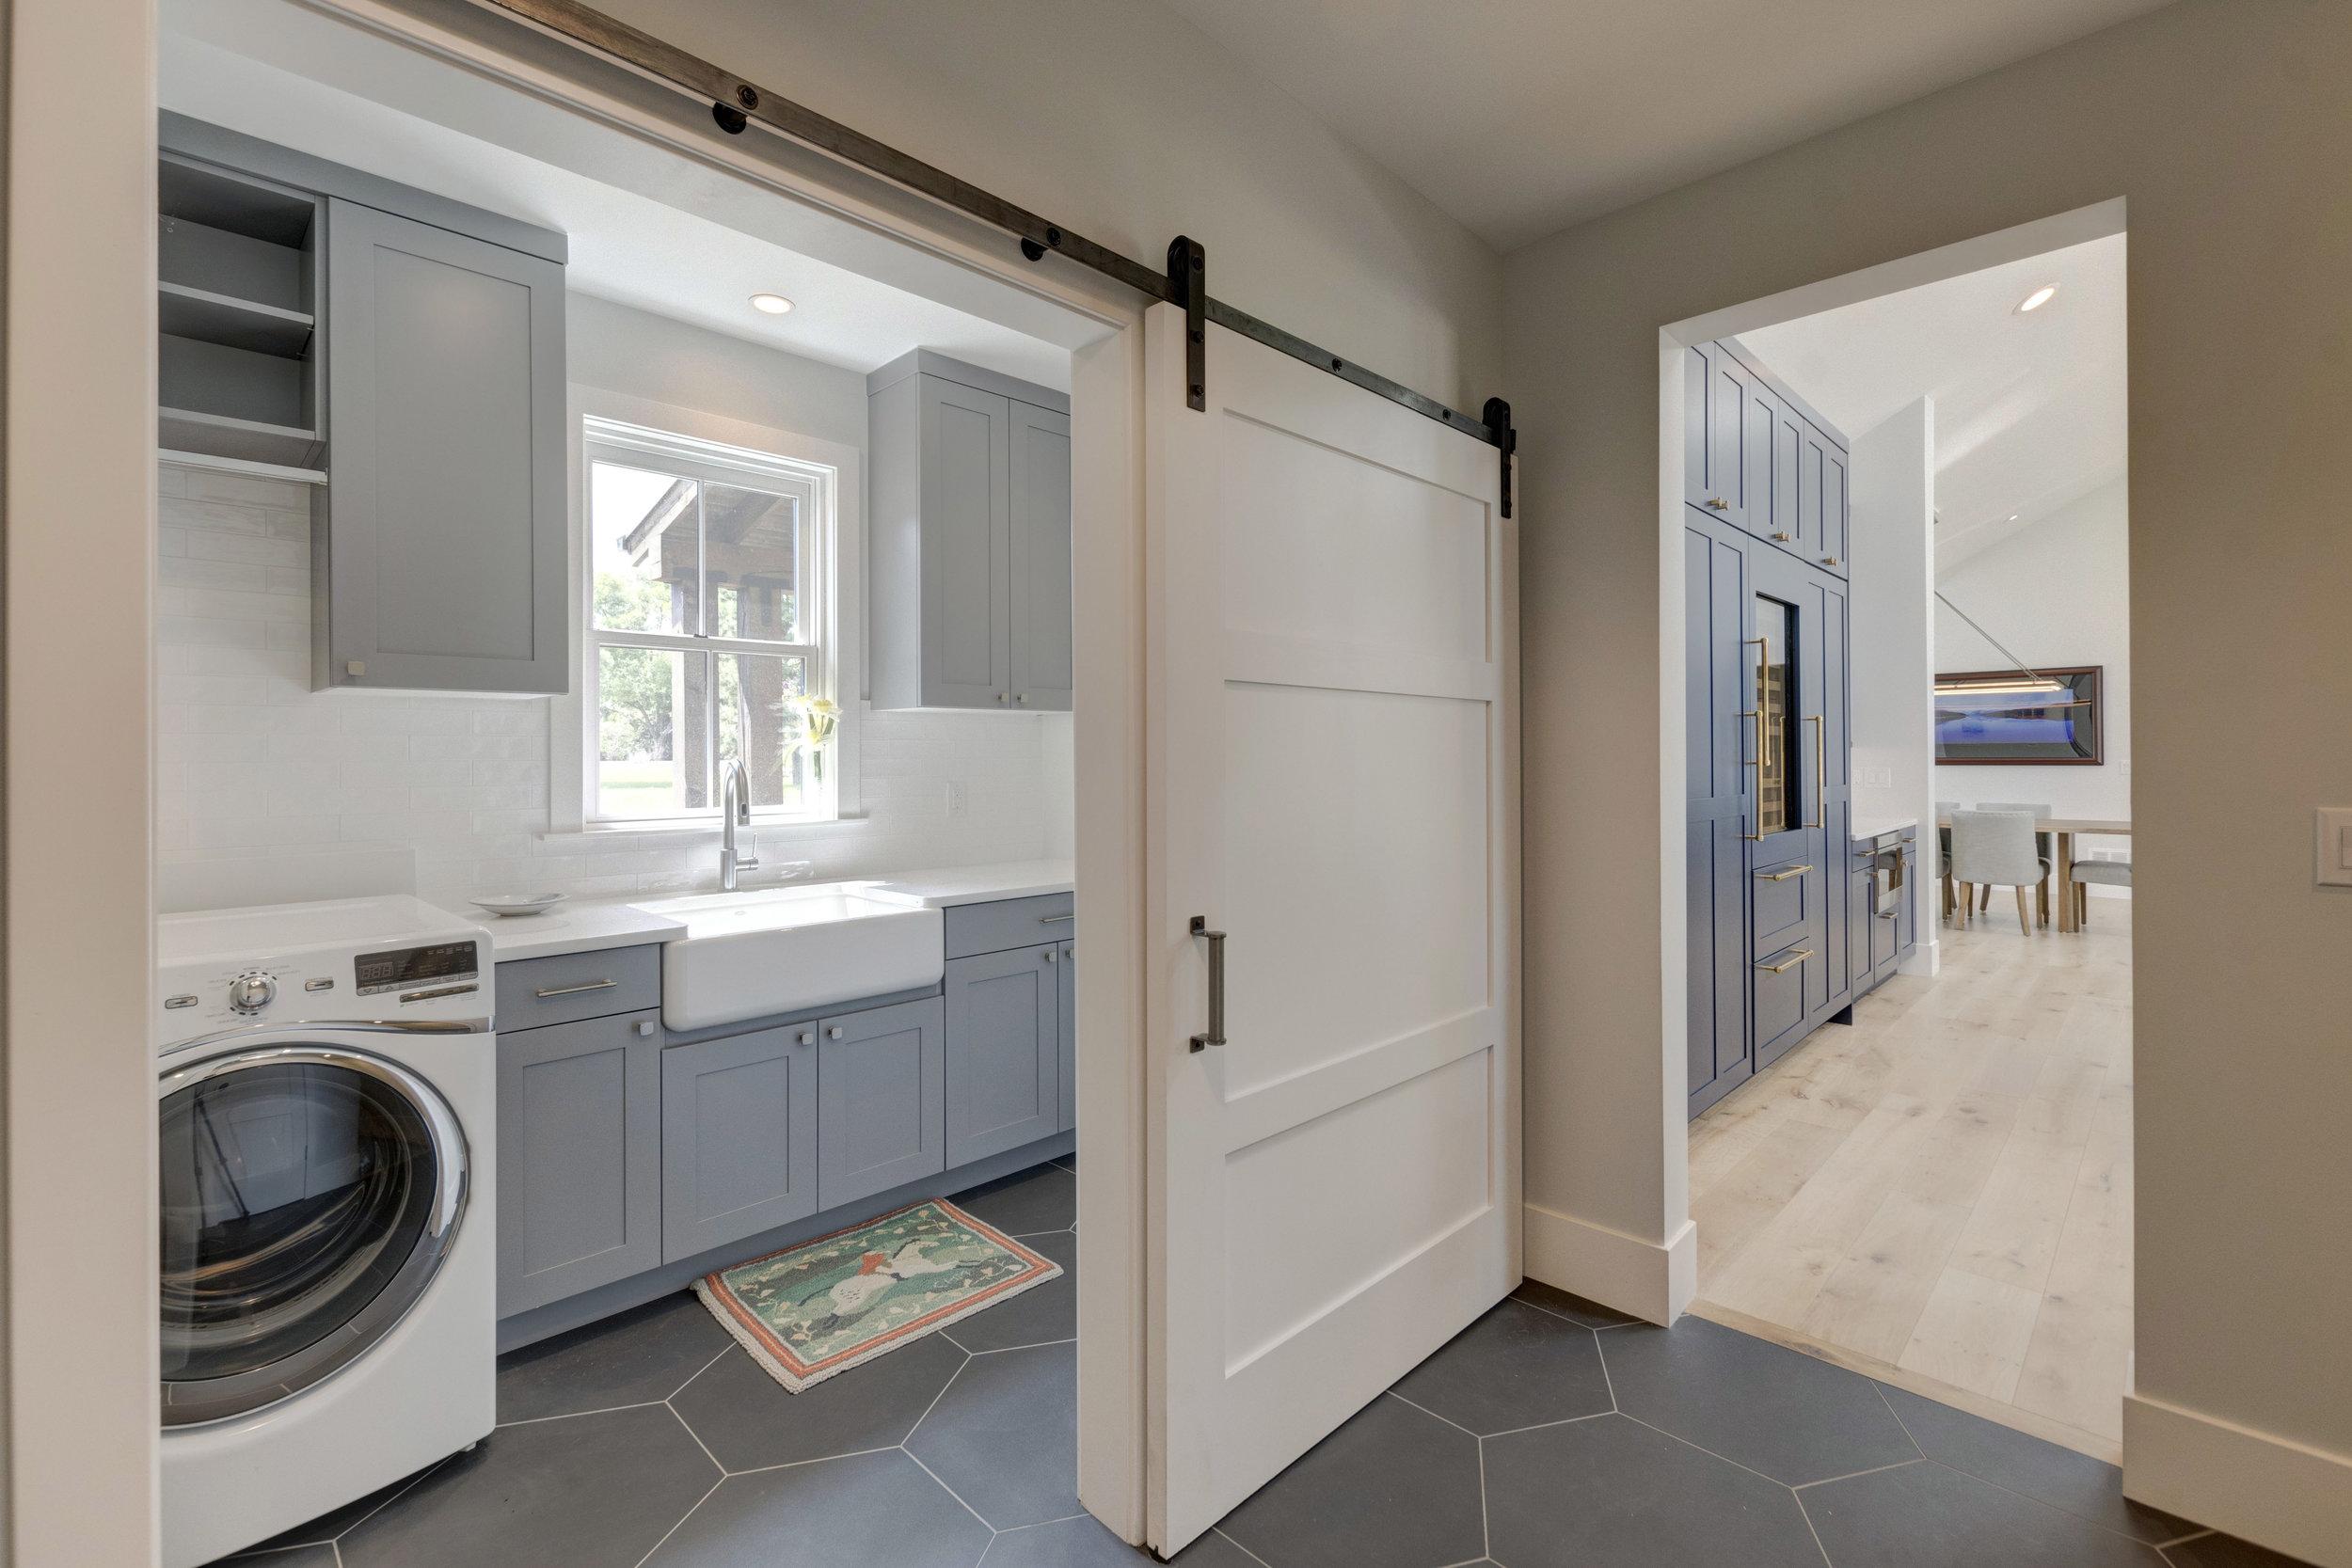 9.1-Laundry Room.jpg